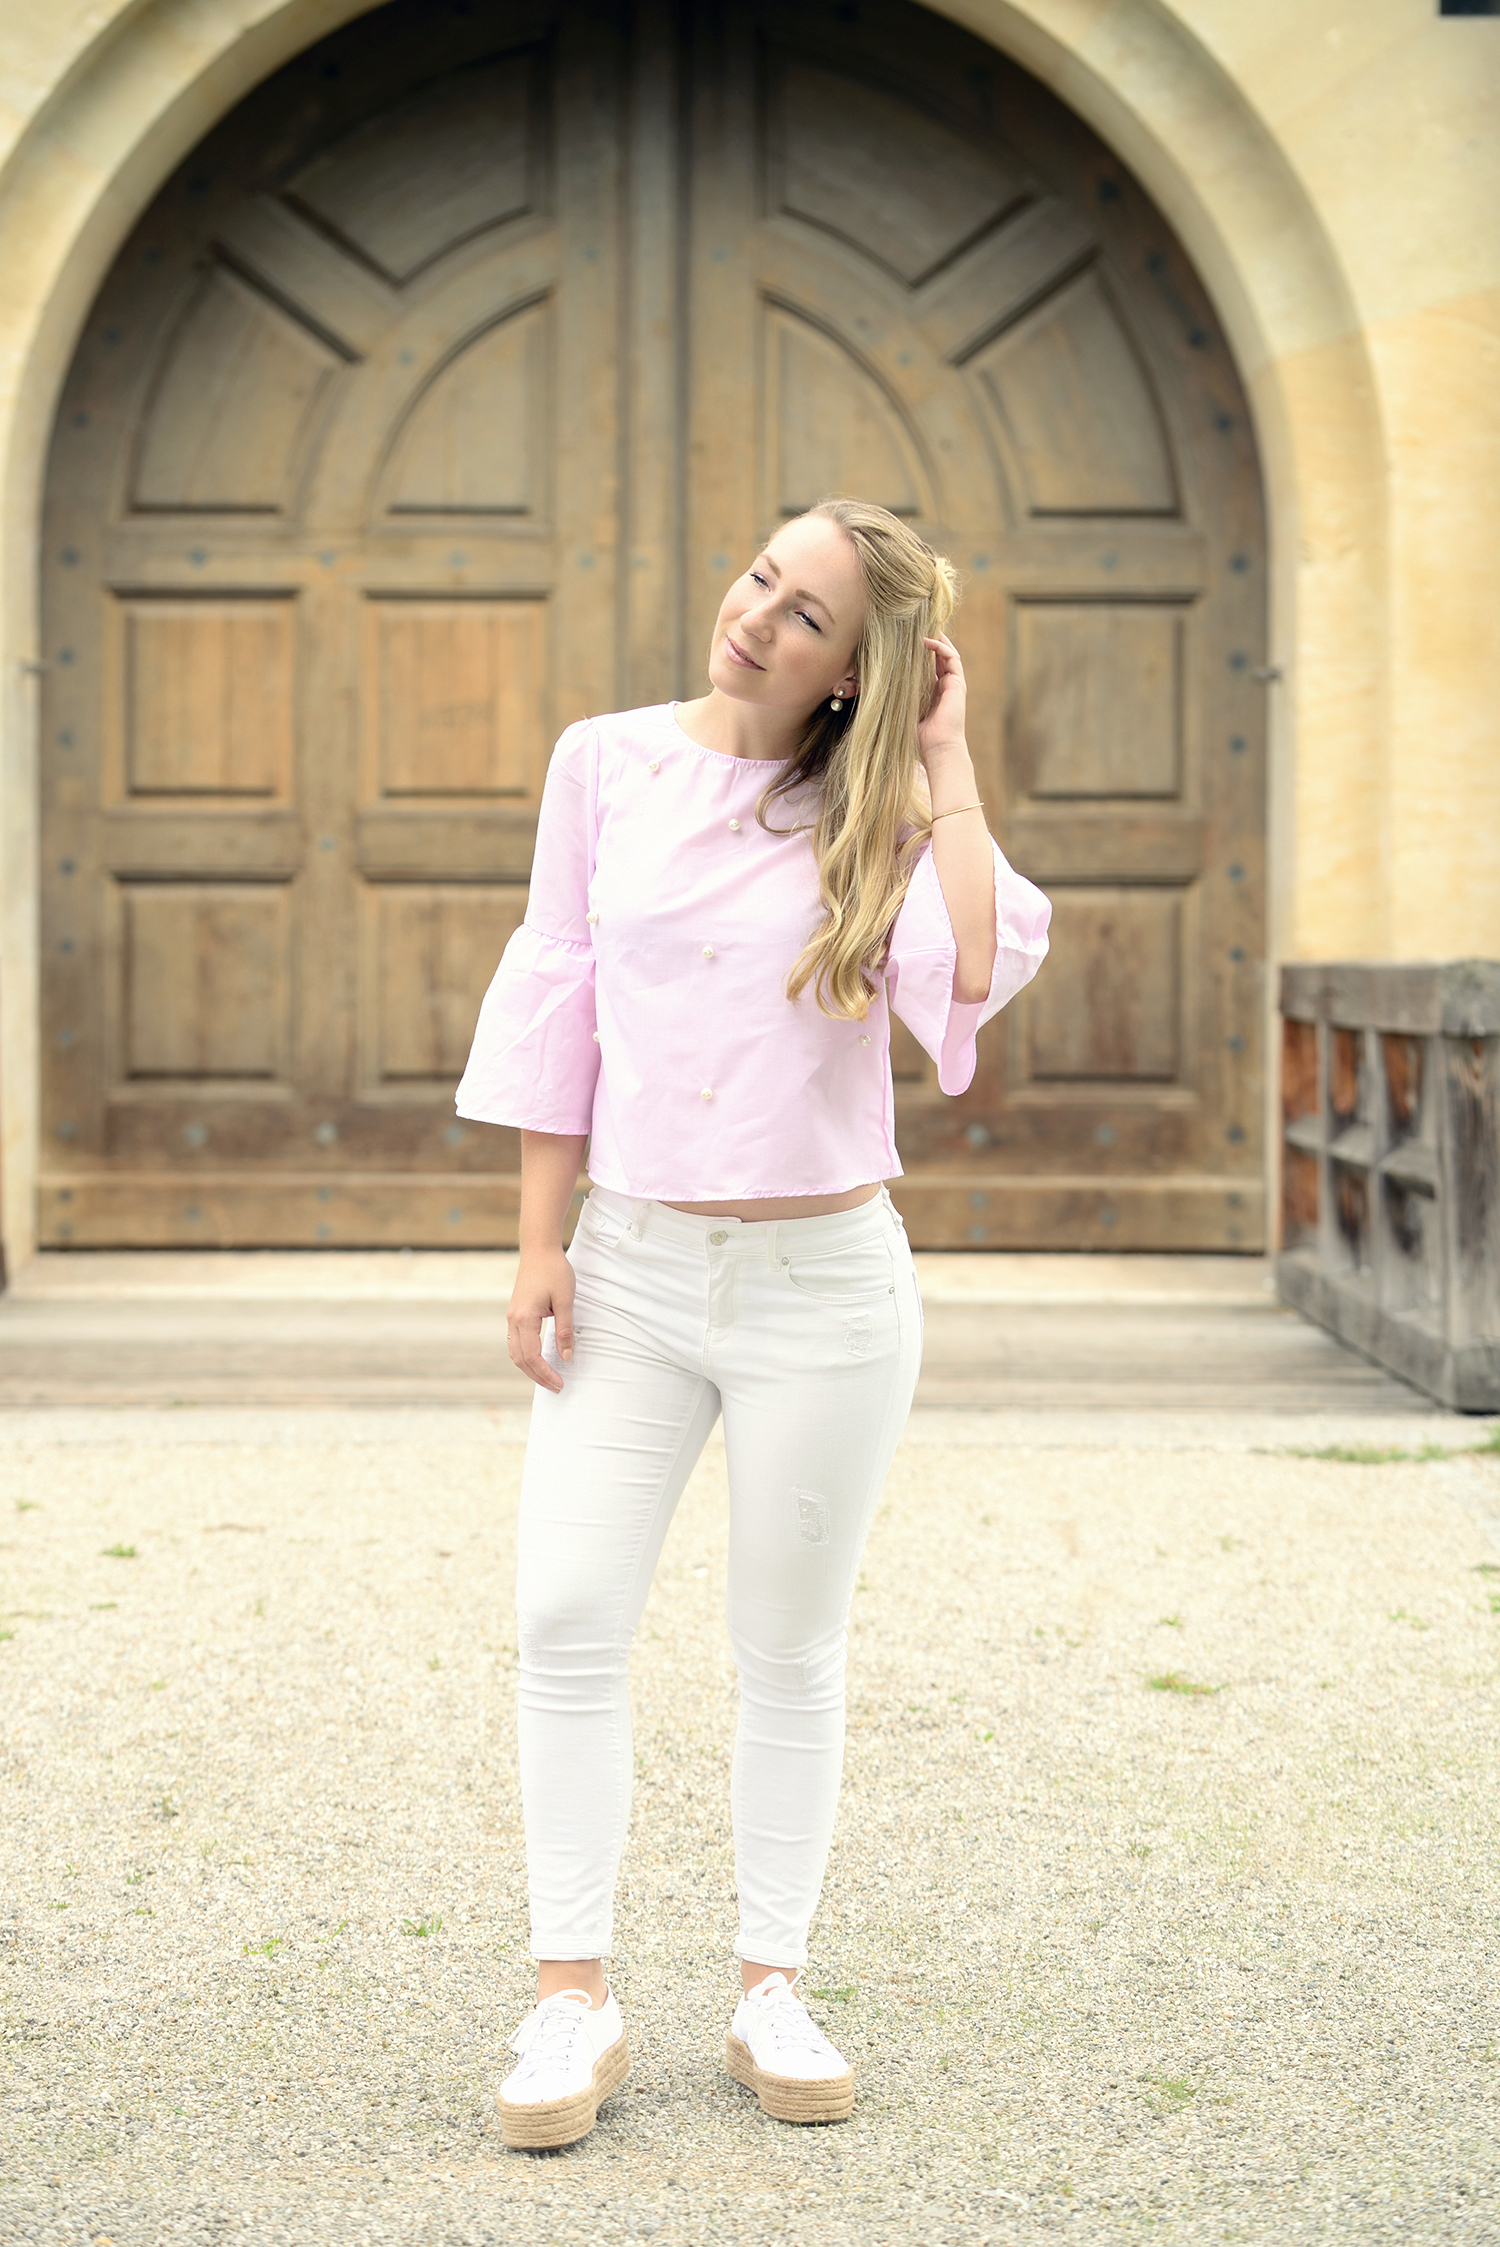 SheIn Pink Blouse